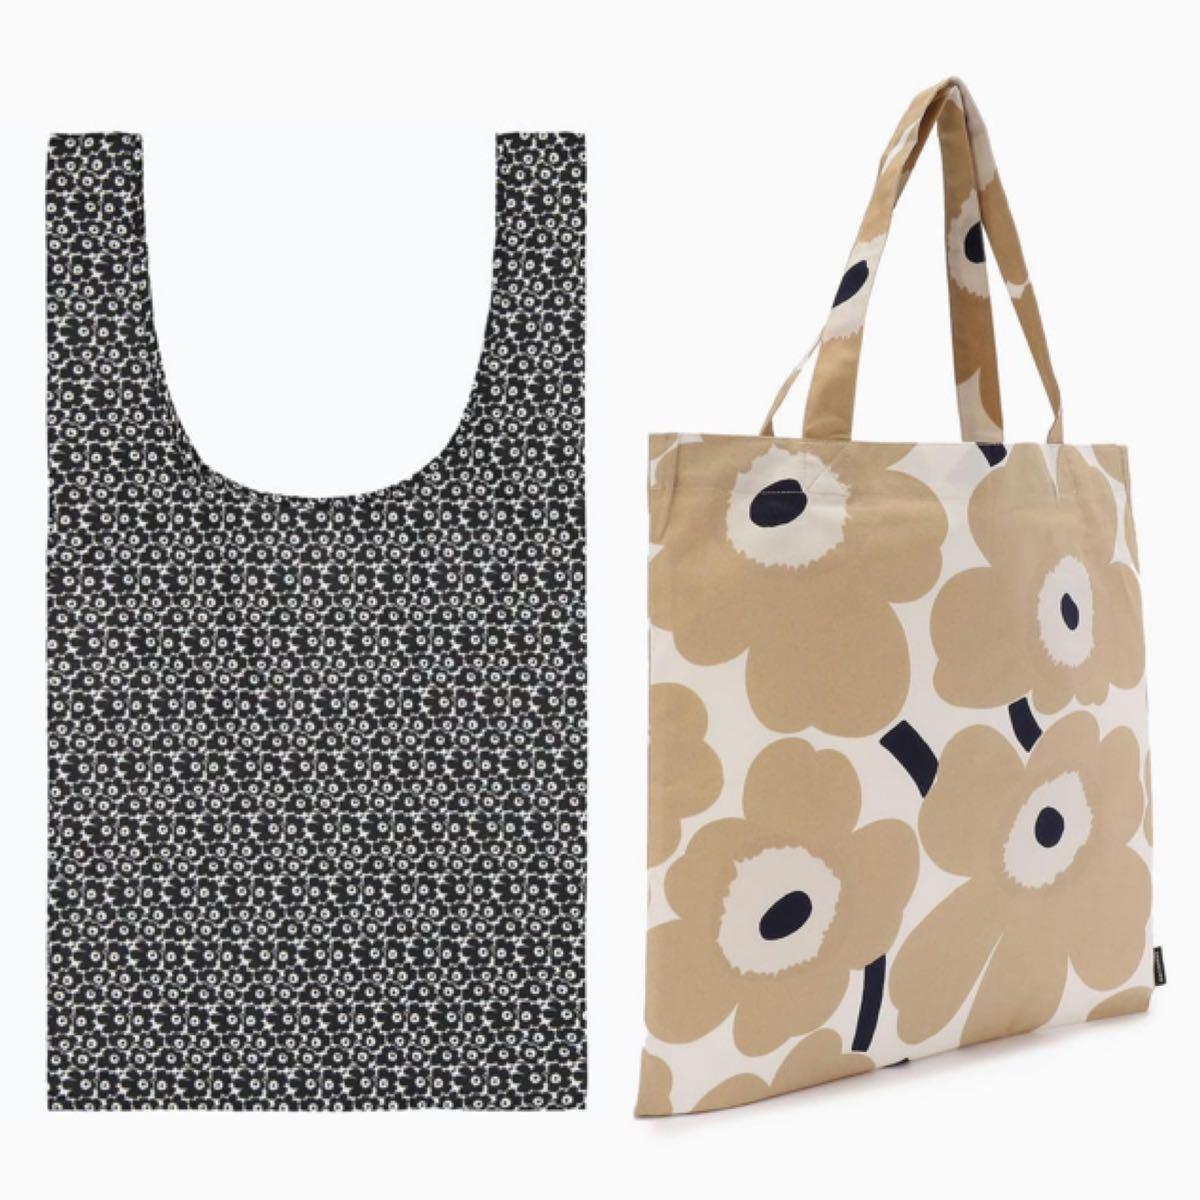 marimekko マリメッコ 完売トートバッグ+人気のスマートバッグ新品送料込